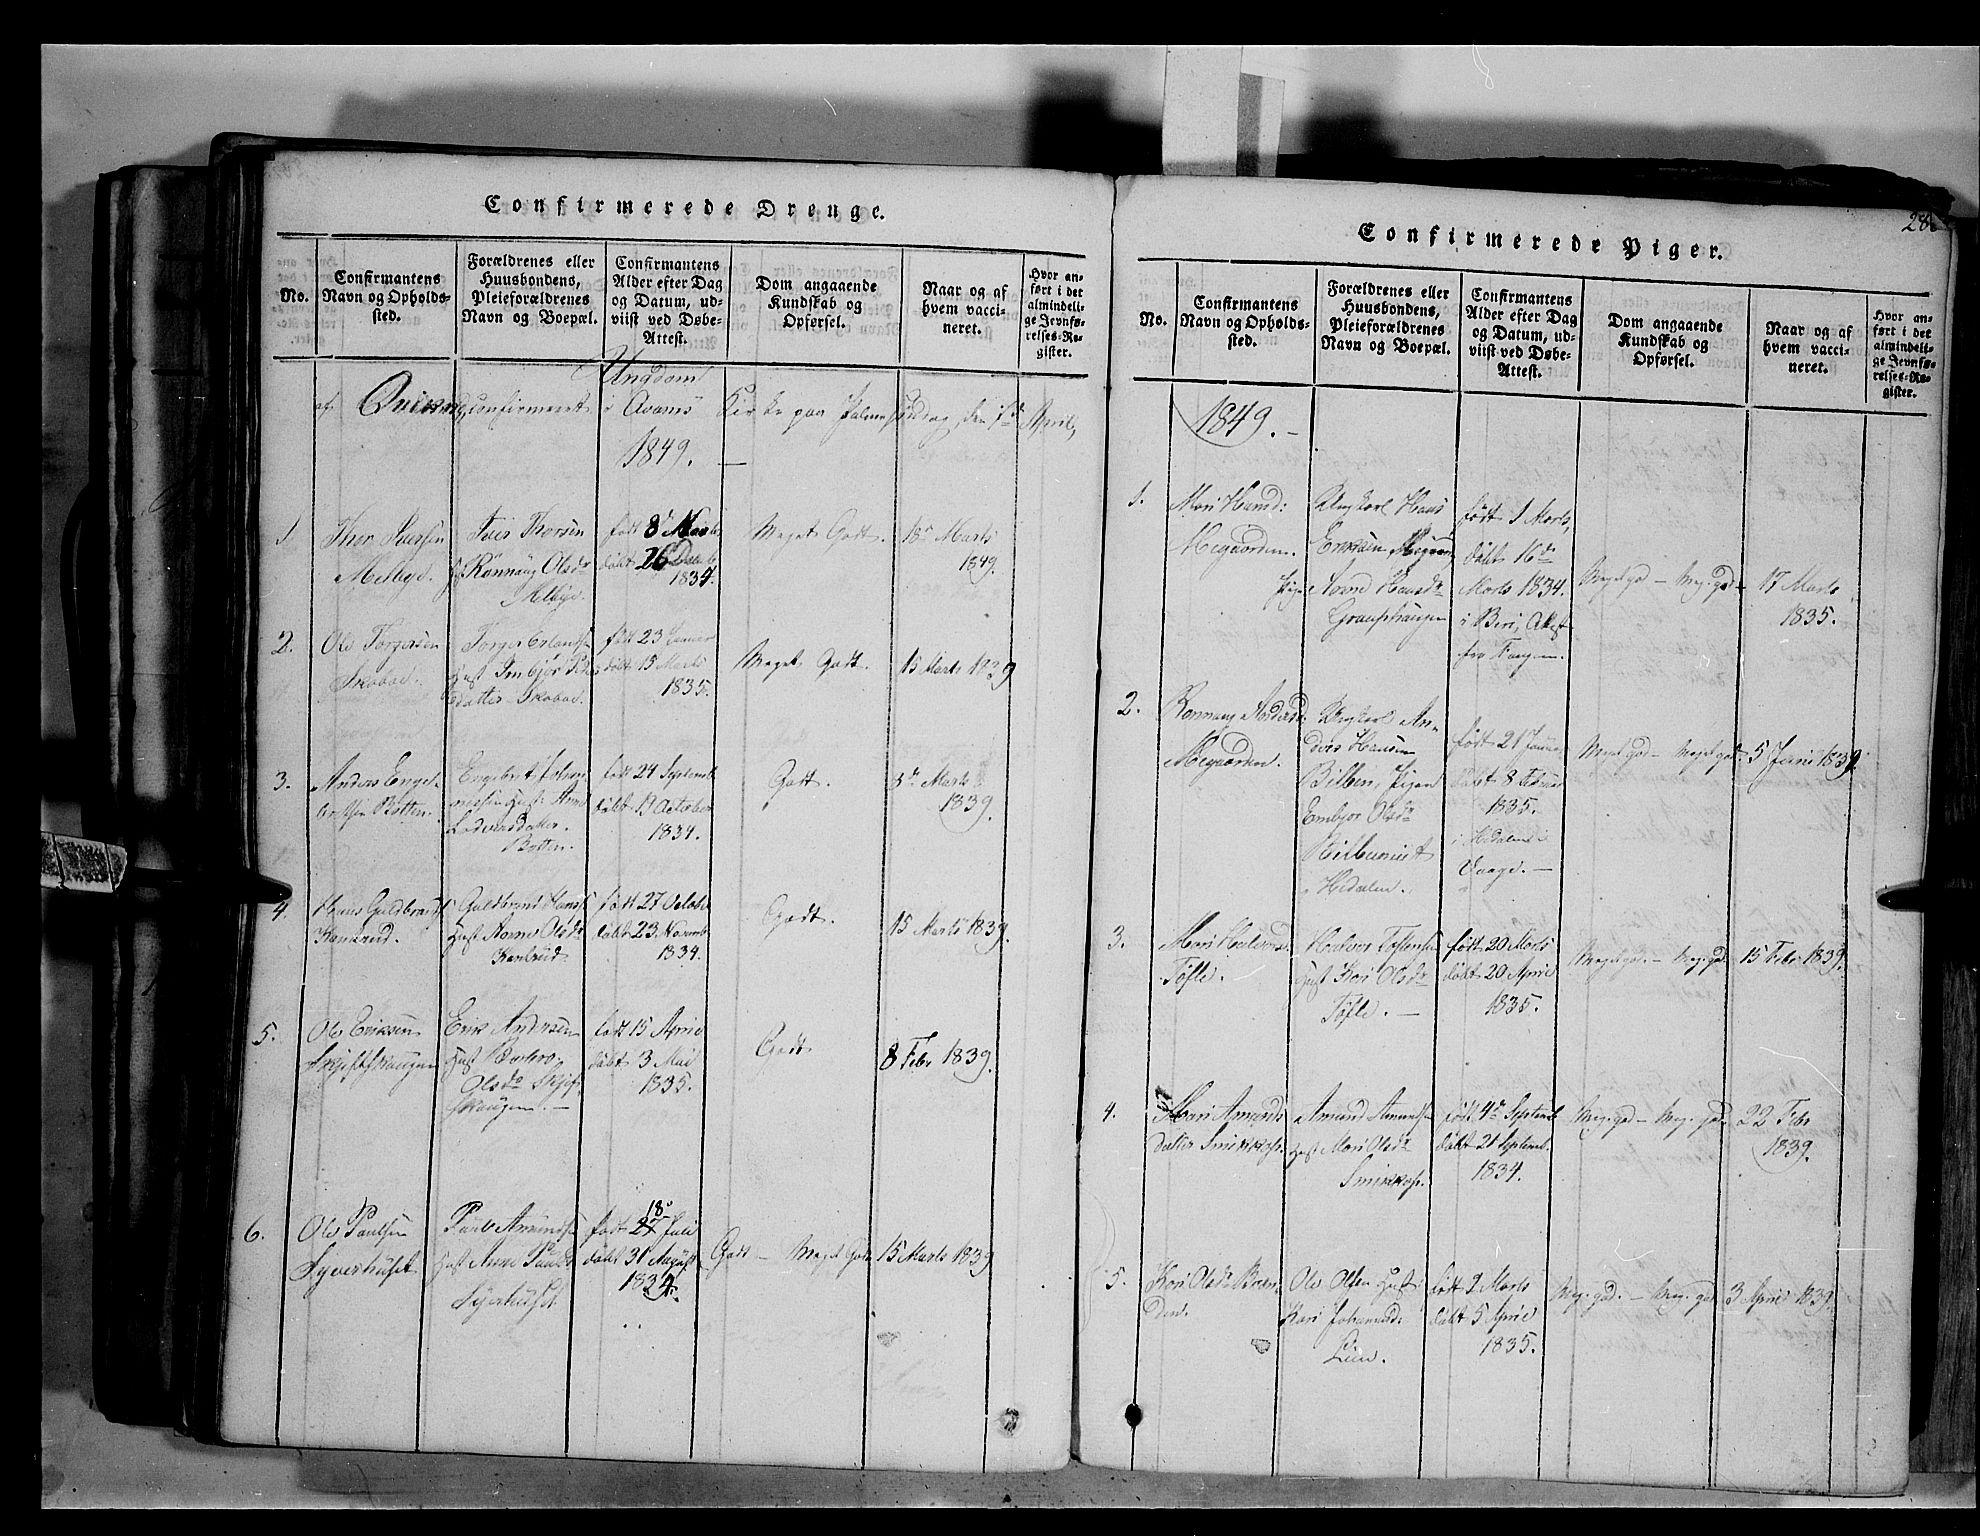 SAH, Fron prestekontor, H/Ha/Hab/L0003: Klokkerbok nr. 3, 1816-1850, s. 286